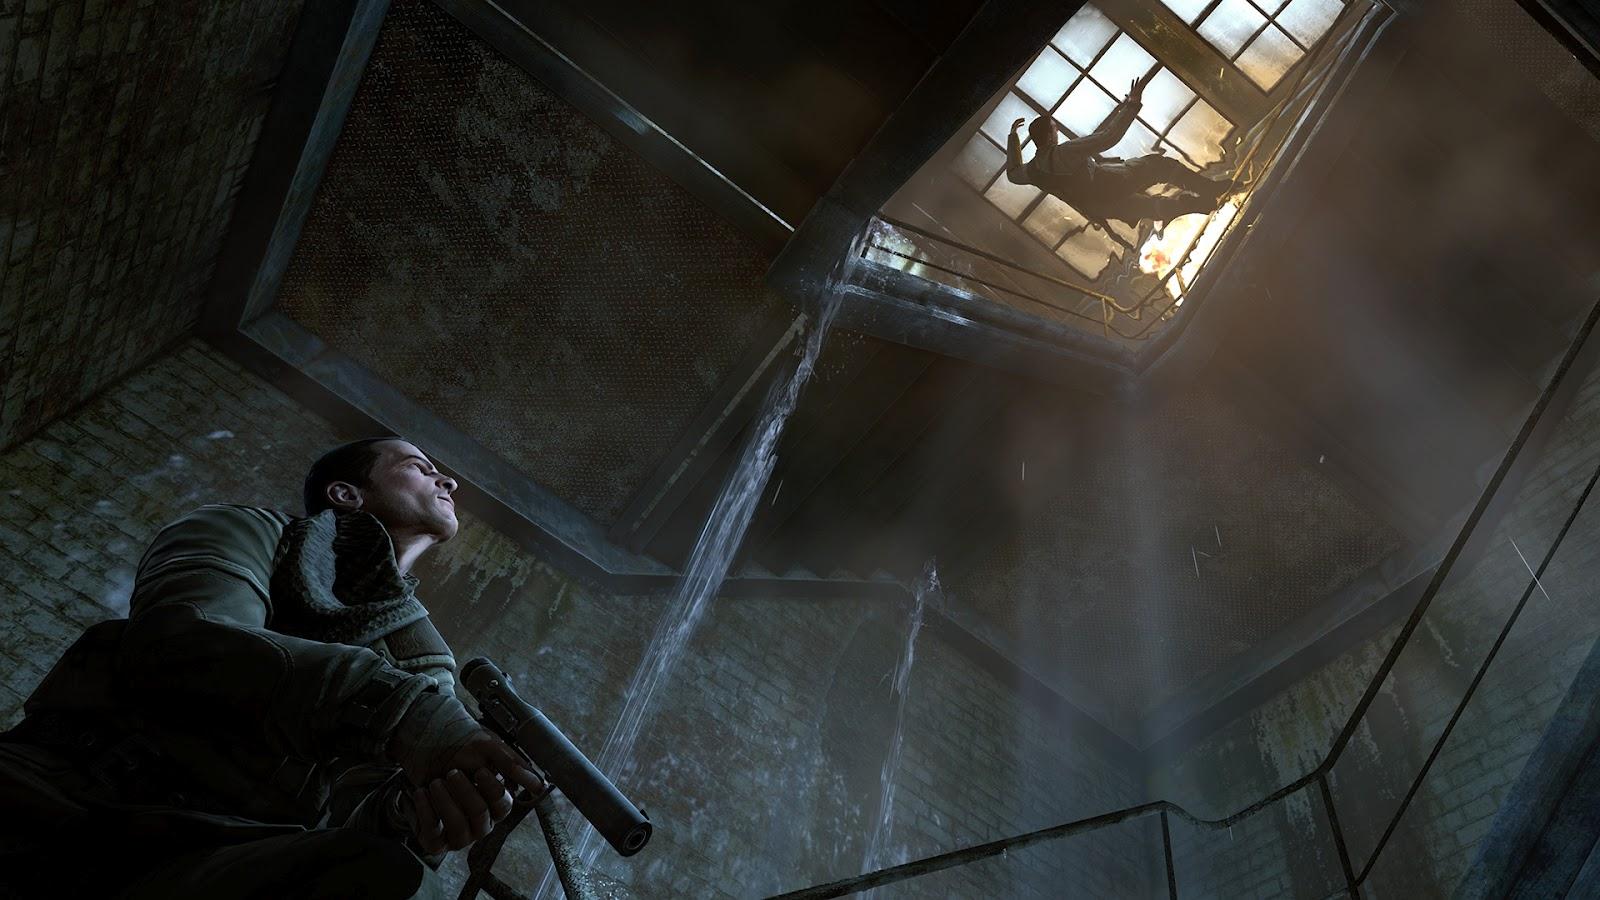 Sniper Elite 3 Wallpaper: Pic New Posts: Elitis Wallpaper Uk